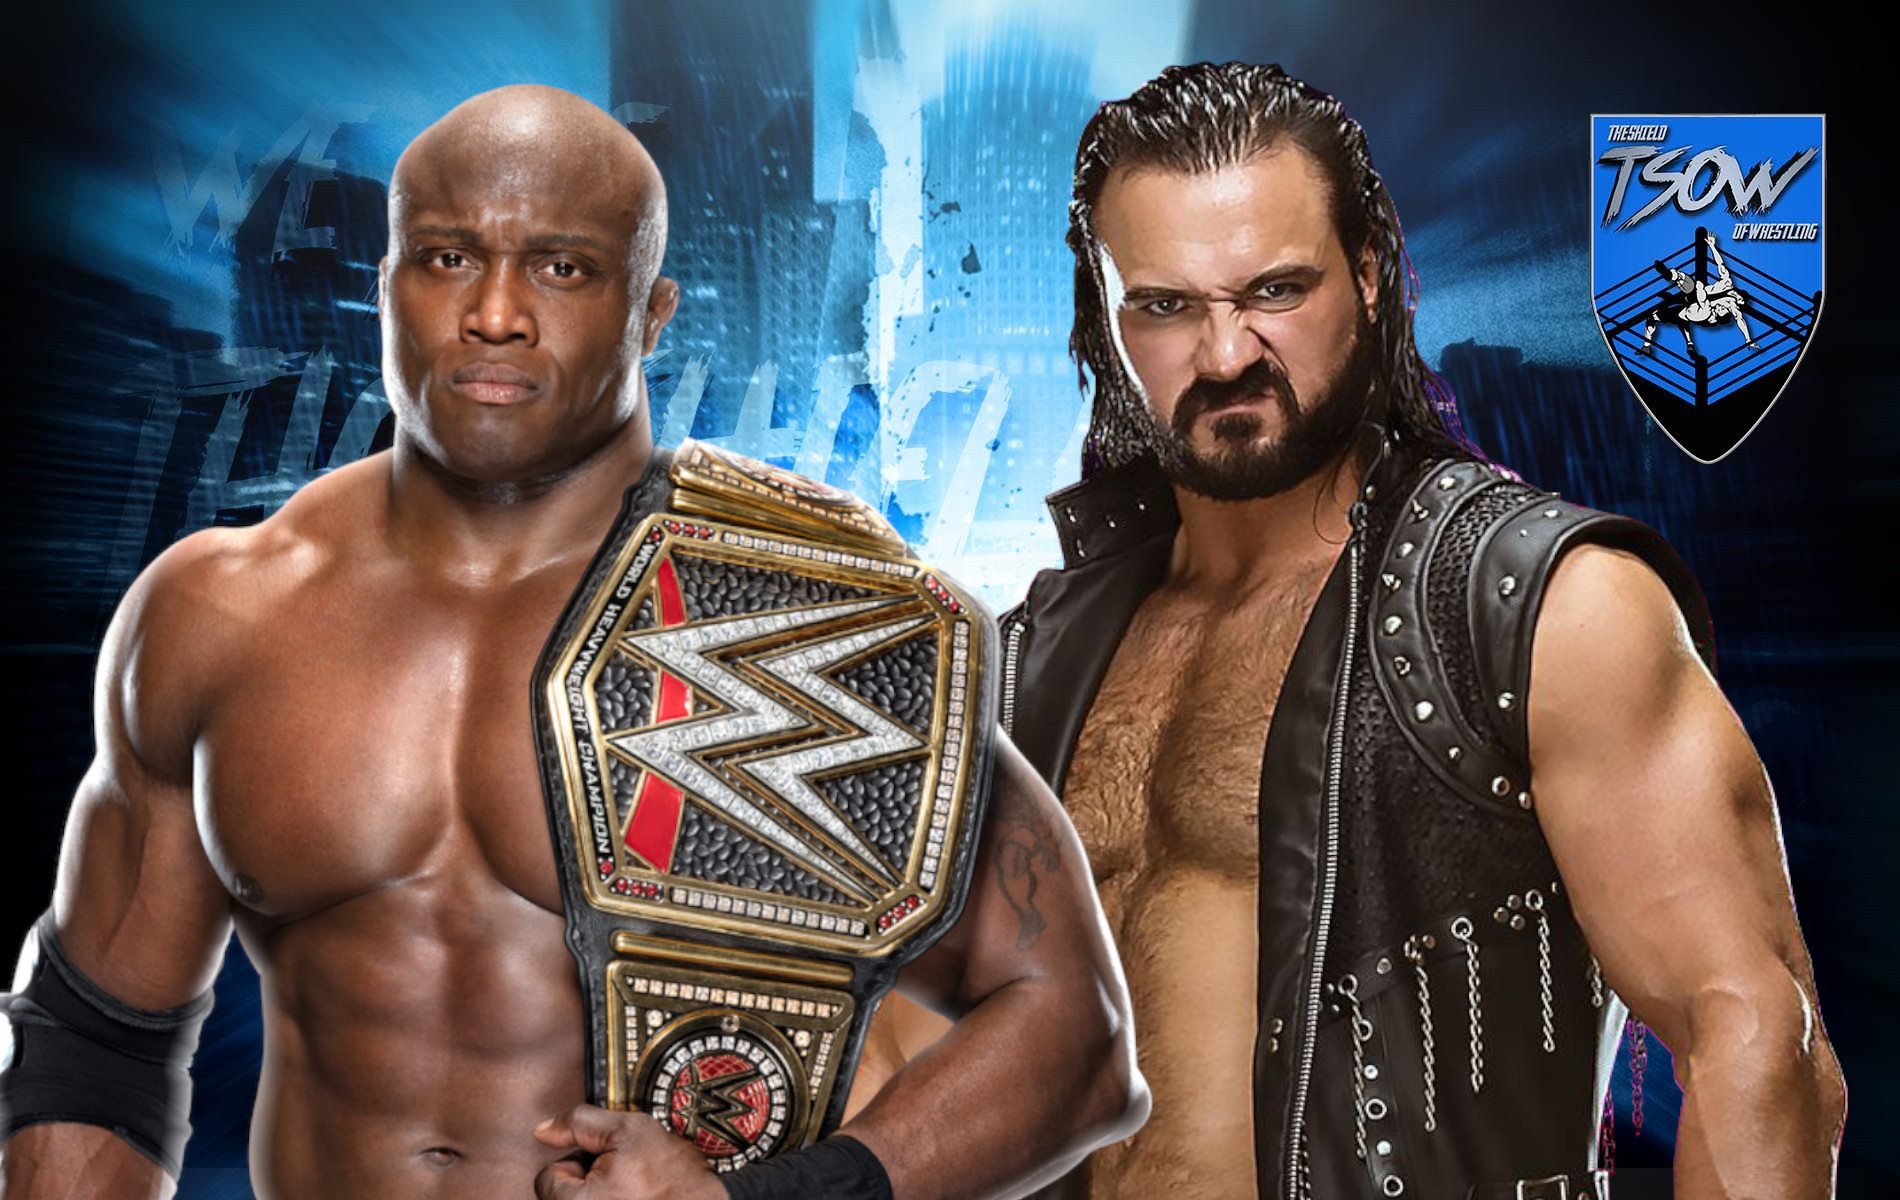 Bobby Lashley vs Drew McIntyre sarà un Hell in a Cell Match